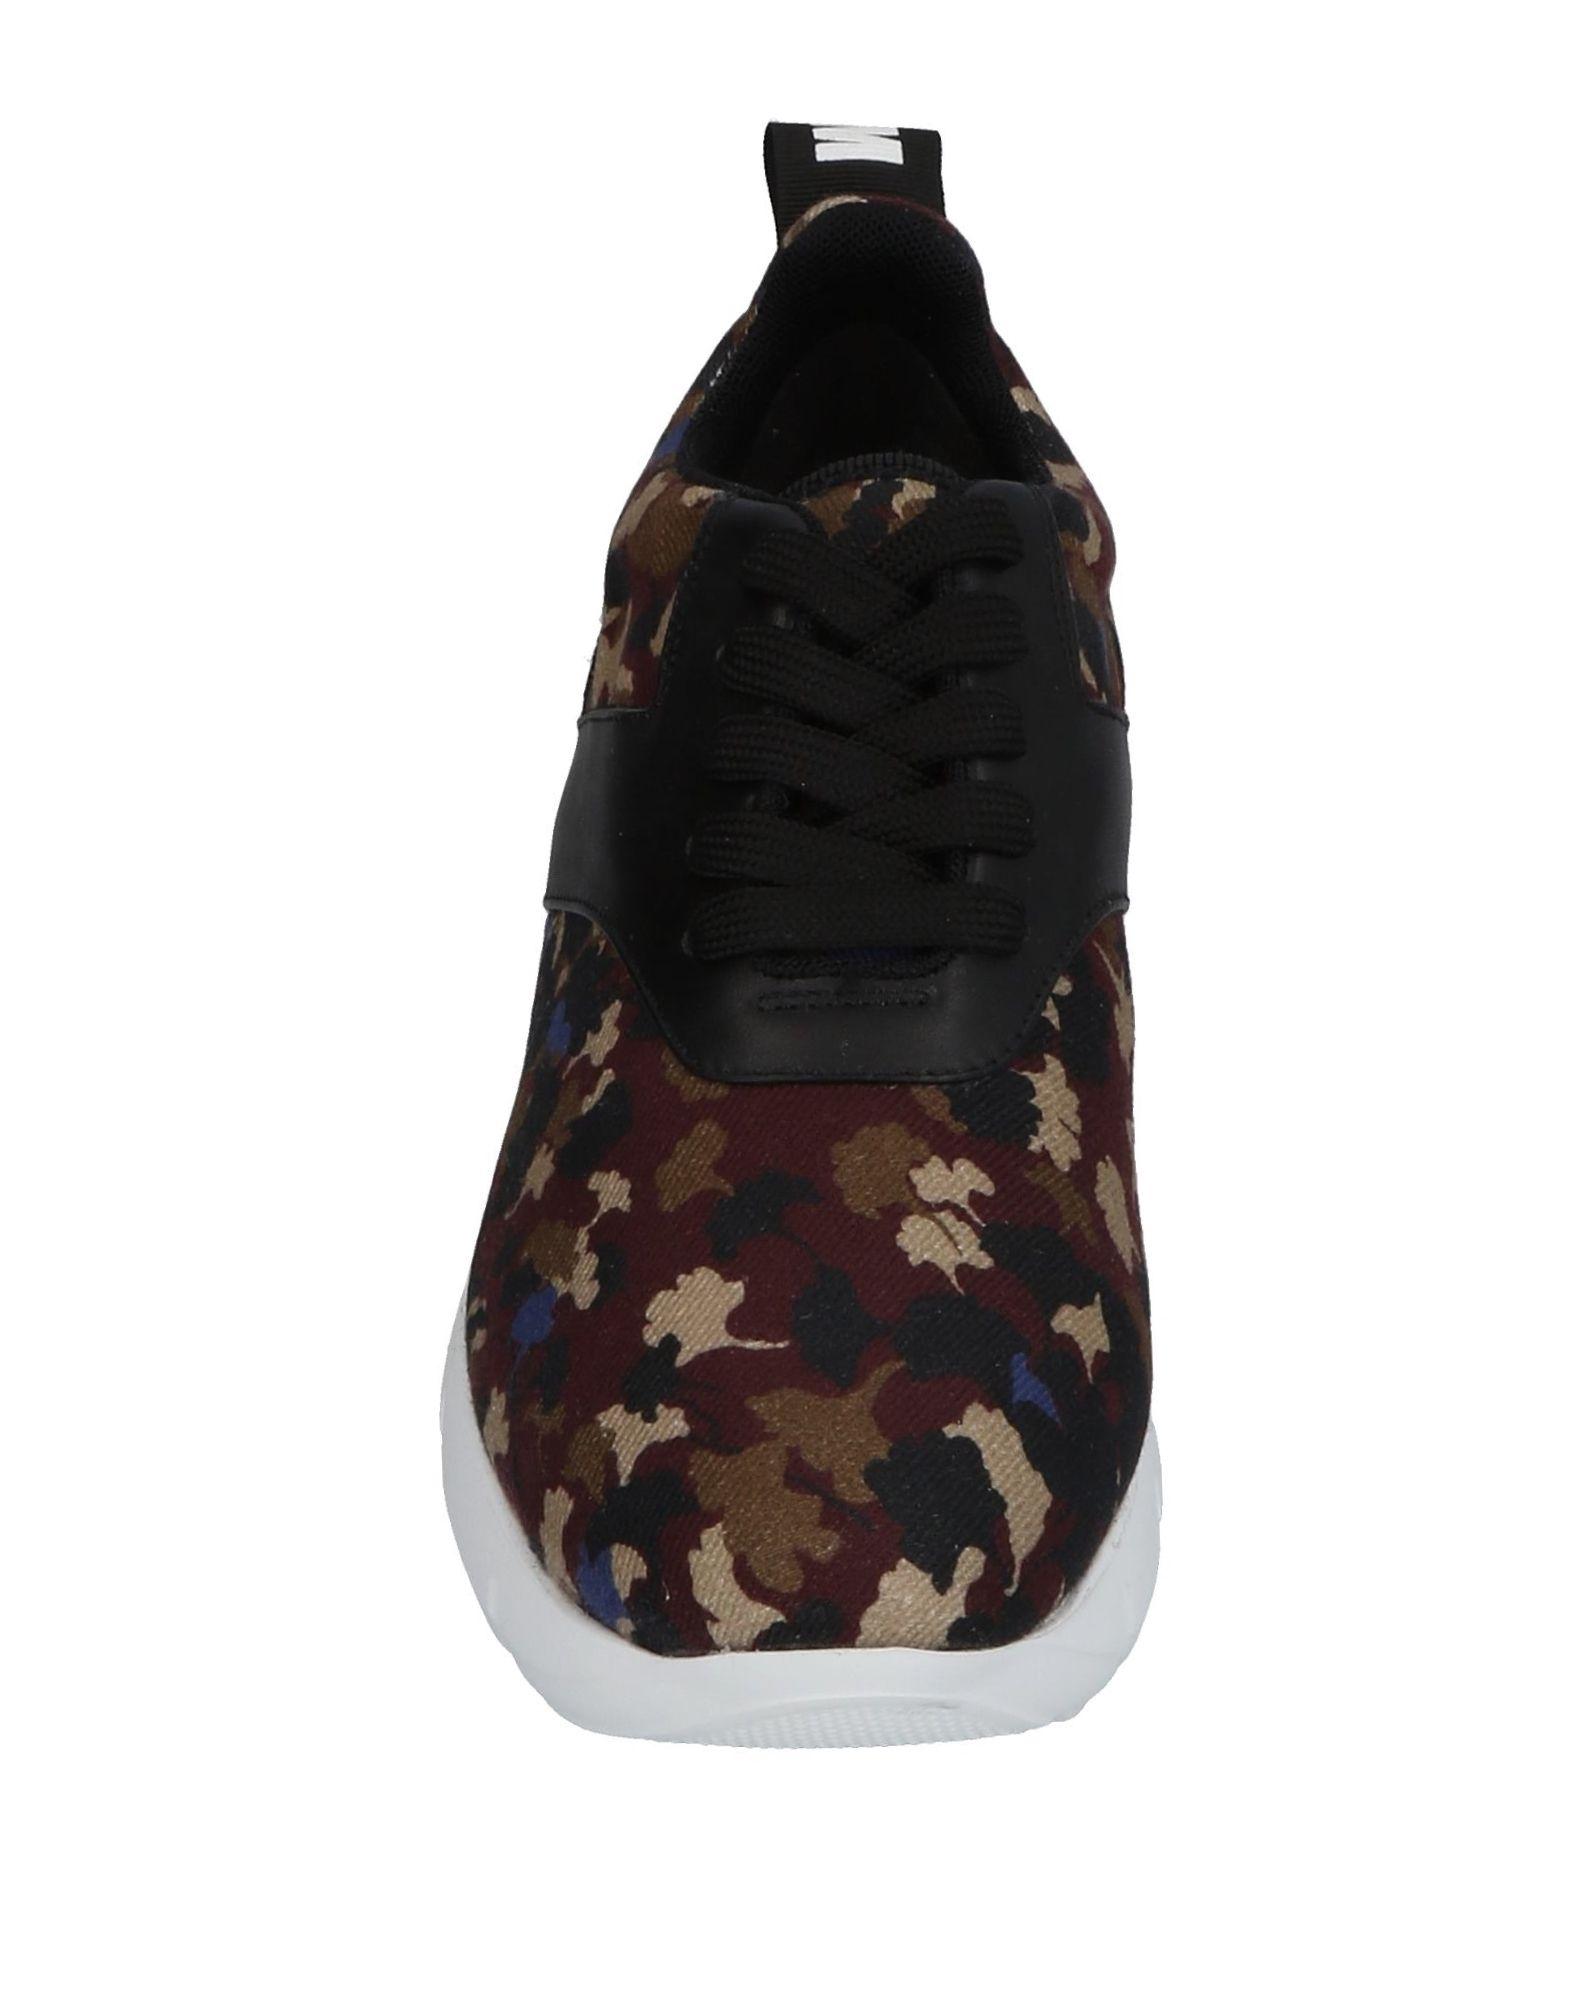 Haltbare Mode billige  Schuhe Msgm Sneakers Damen  billige 11419052LT Heiße Schuhe 45dabc